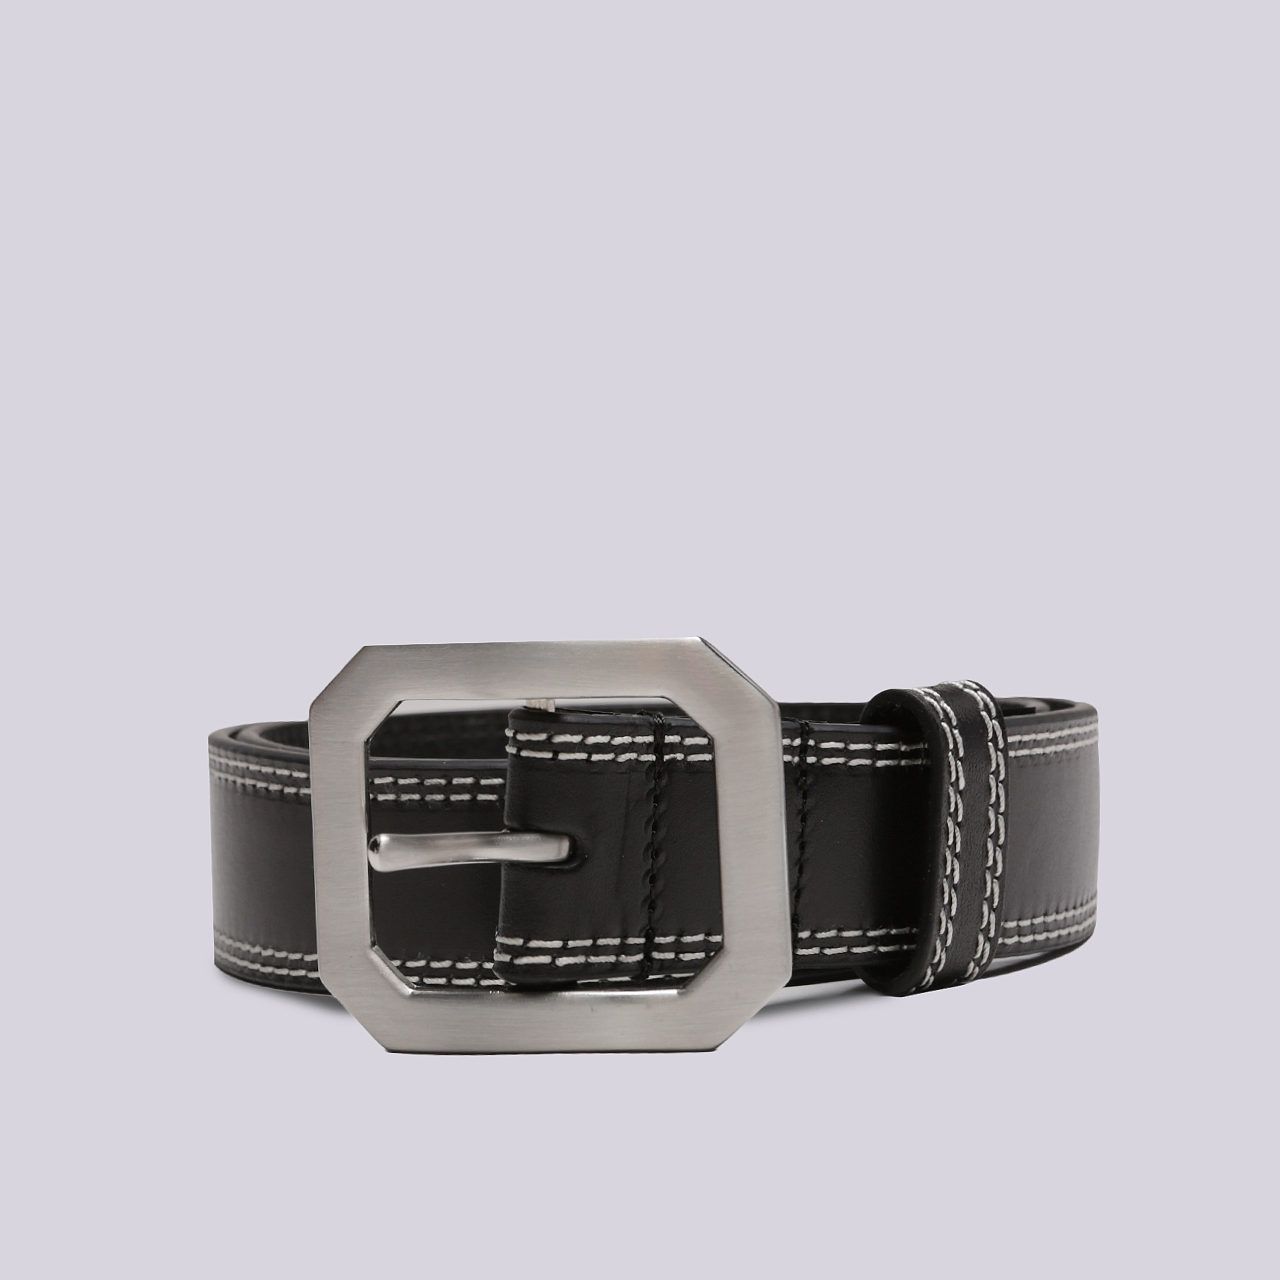 Ремень Stussy Contrast Stitch Leather Belt